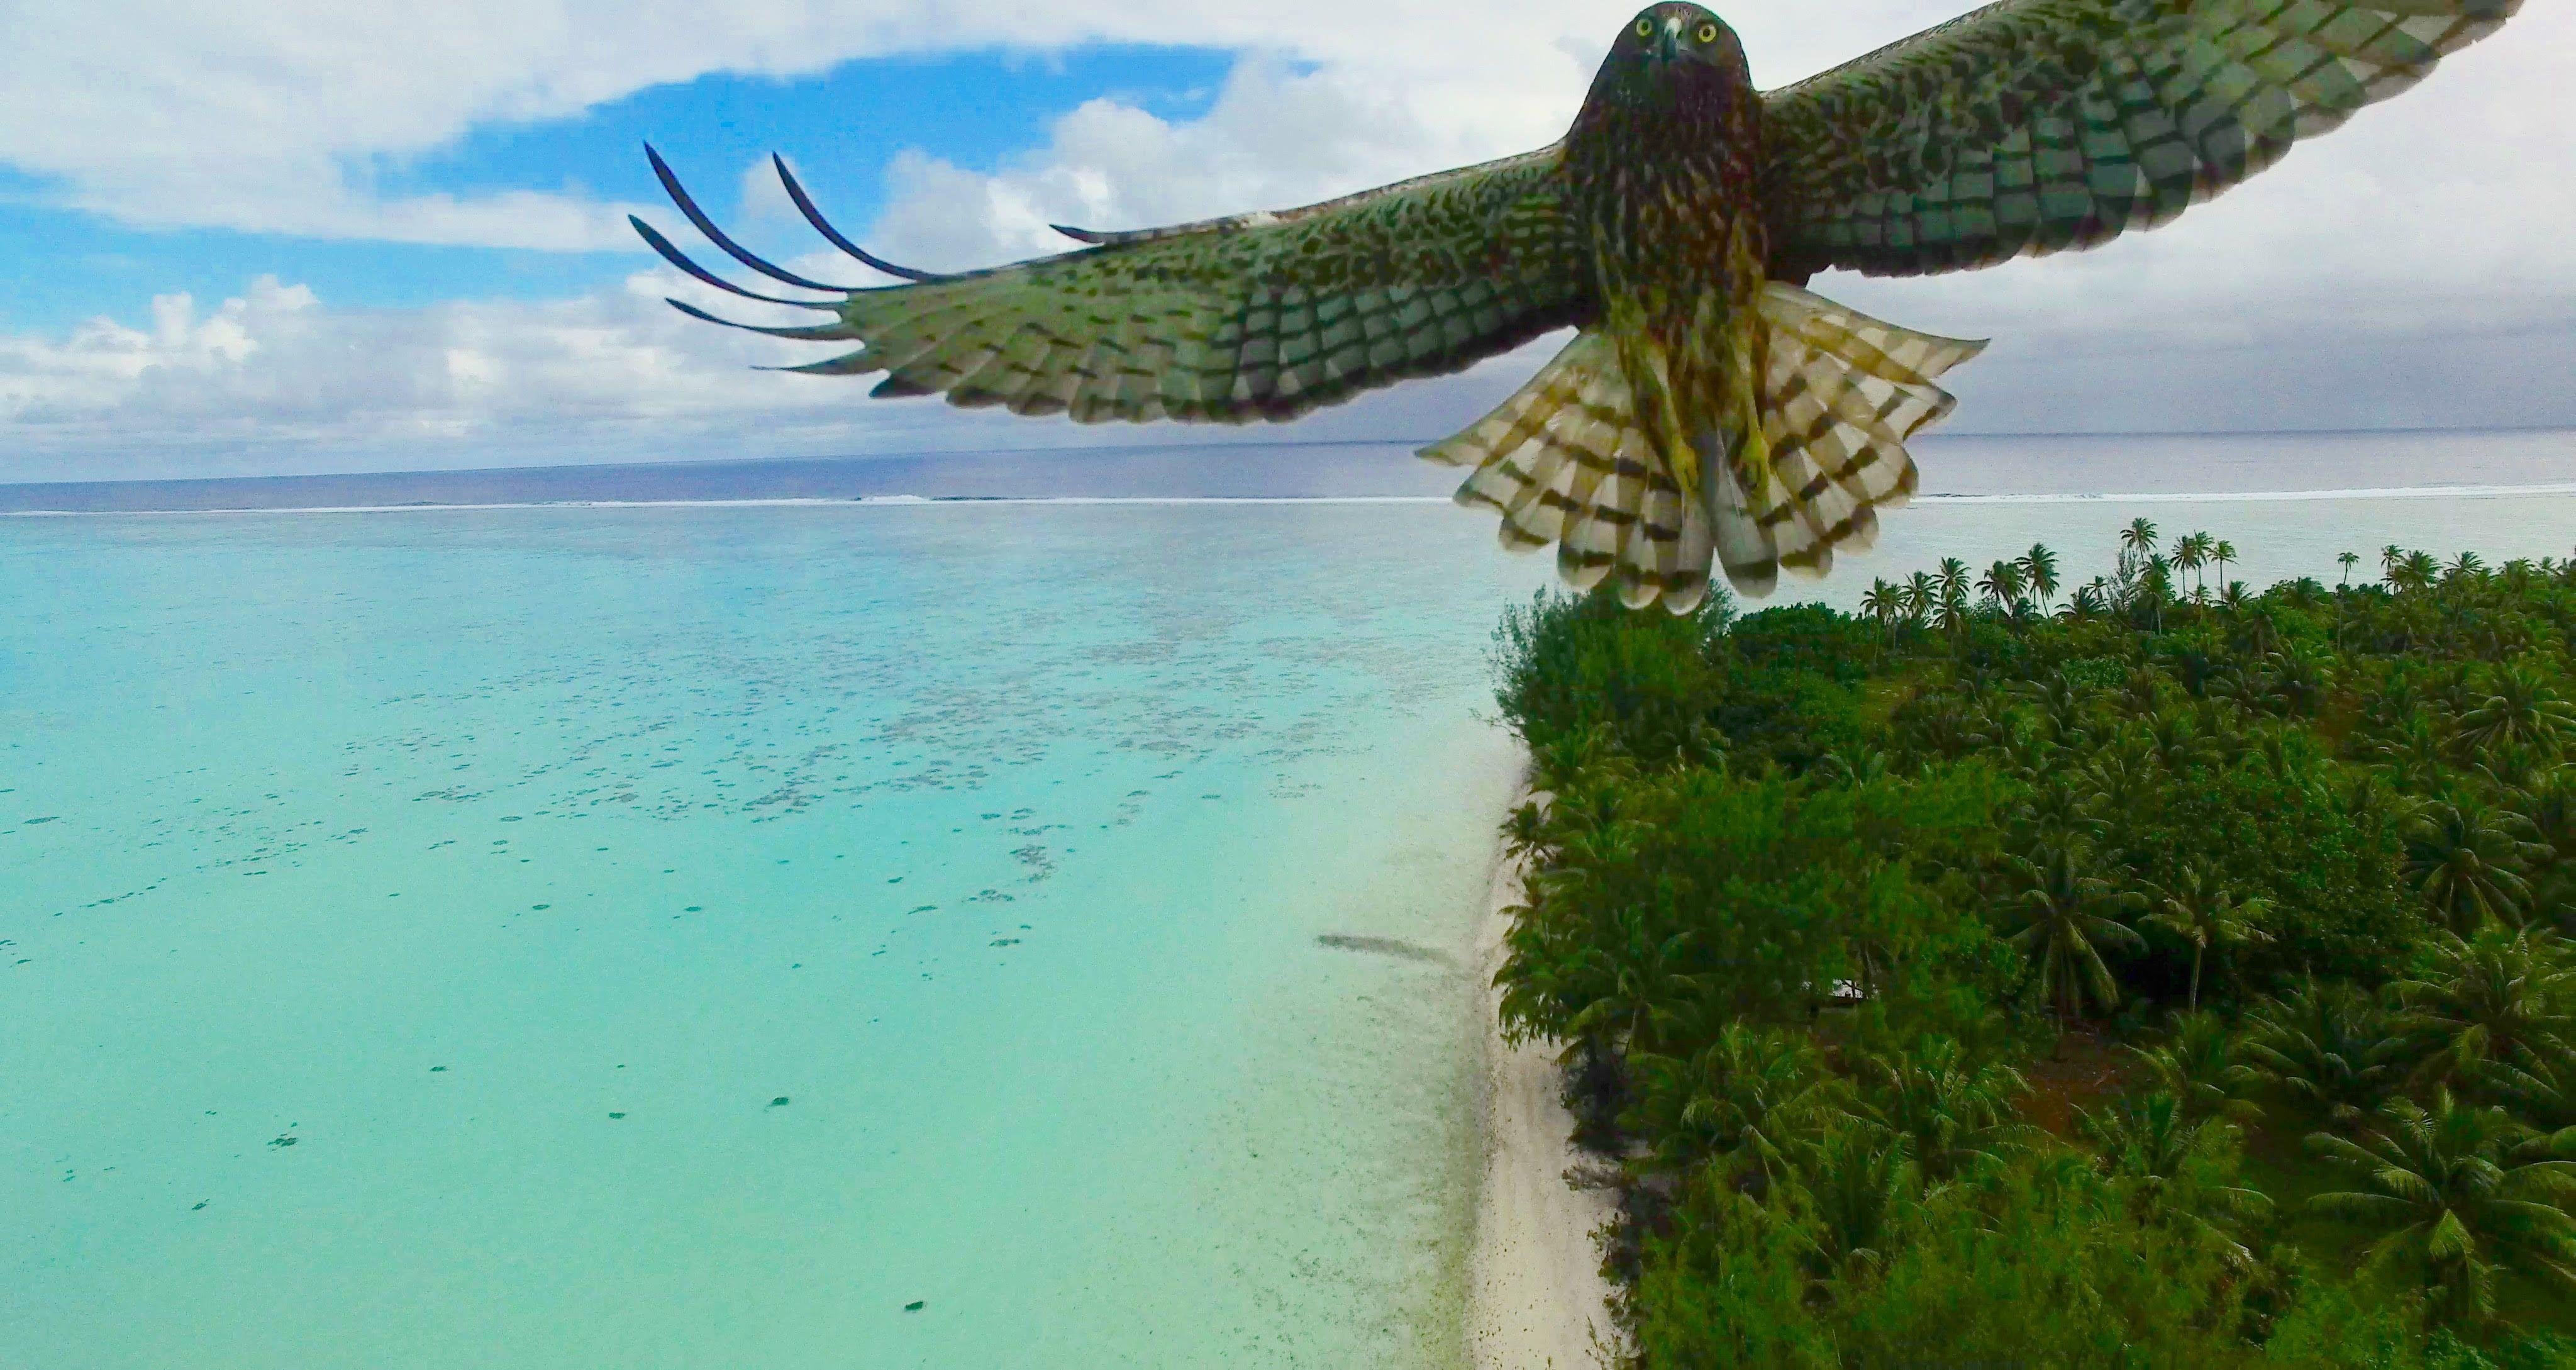 Best Drone Photos